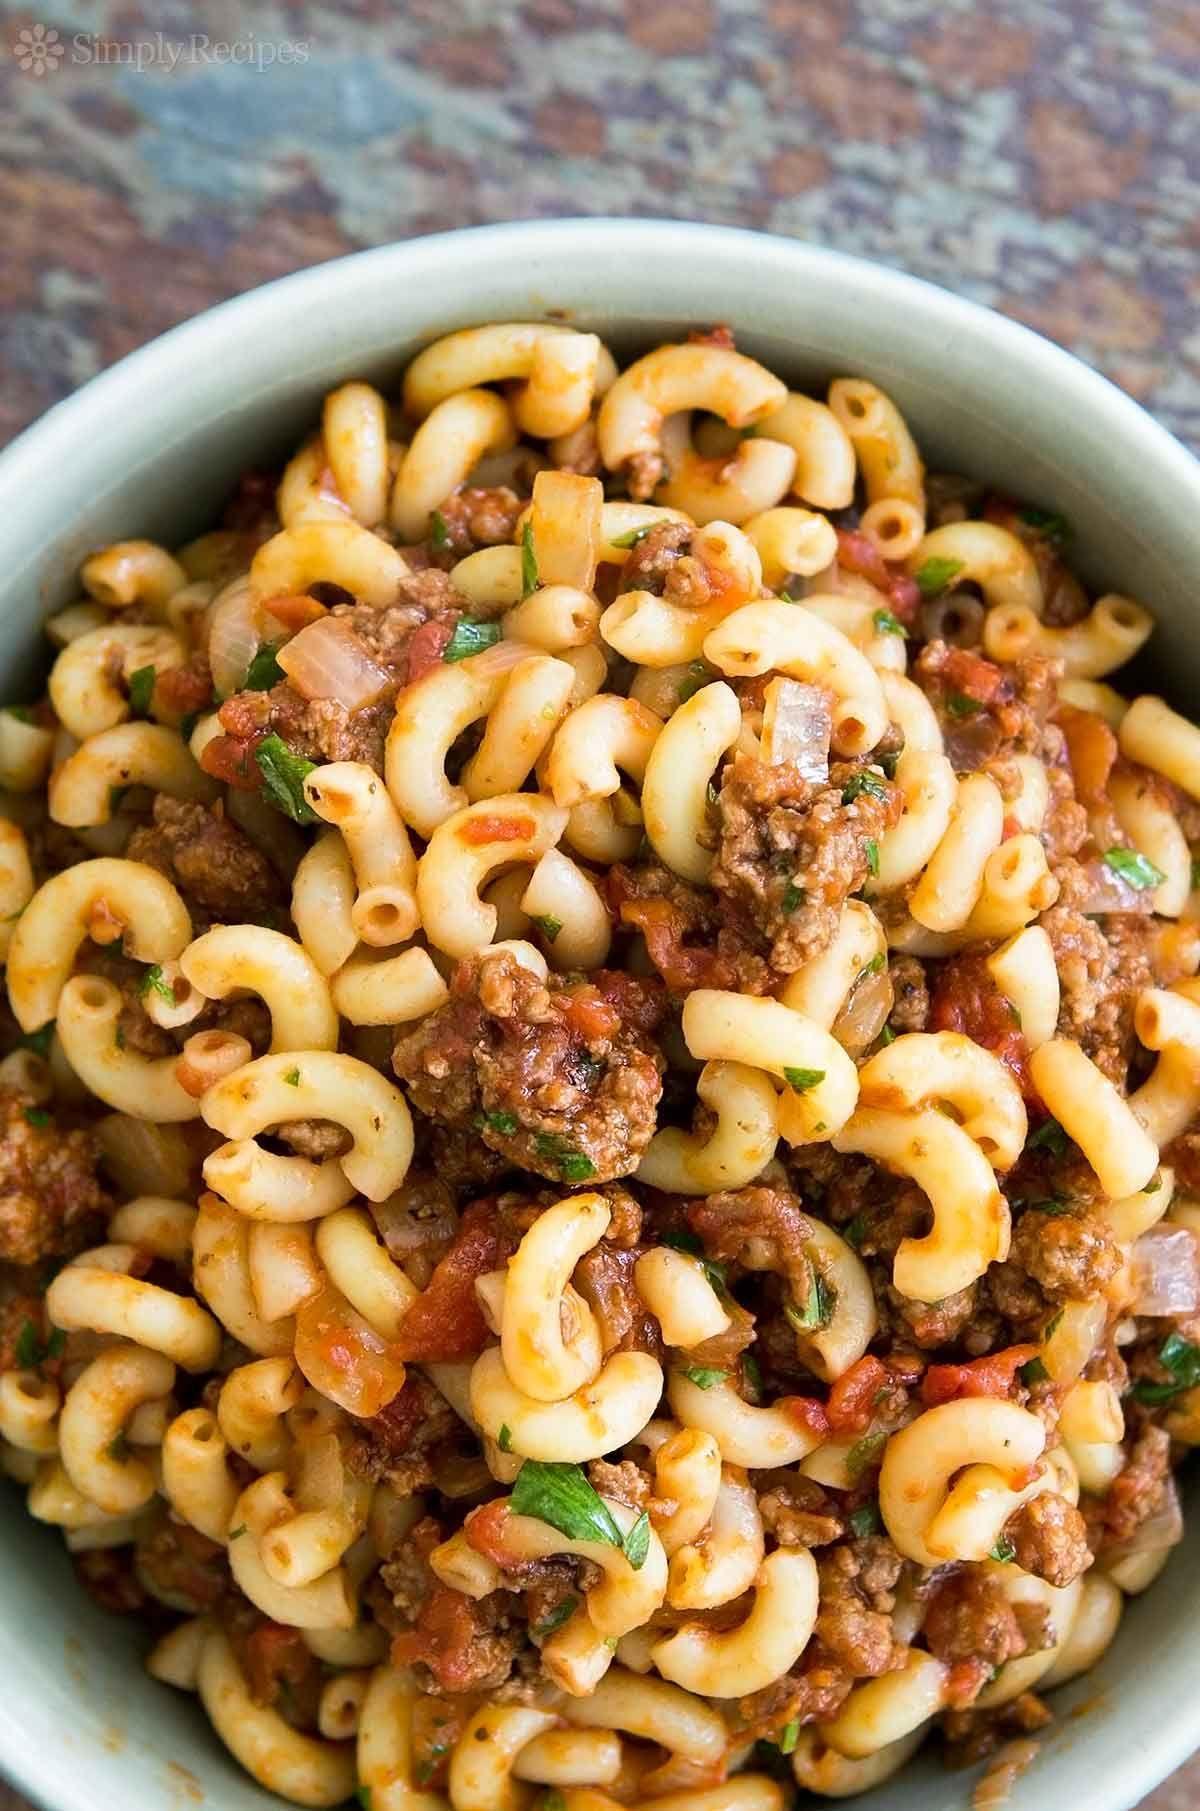 Hamburger And Macaroni Recipe Simplyrecipes Com Pasta Recipes Macaroni Recipes Elbow Pasta Recipes